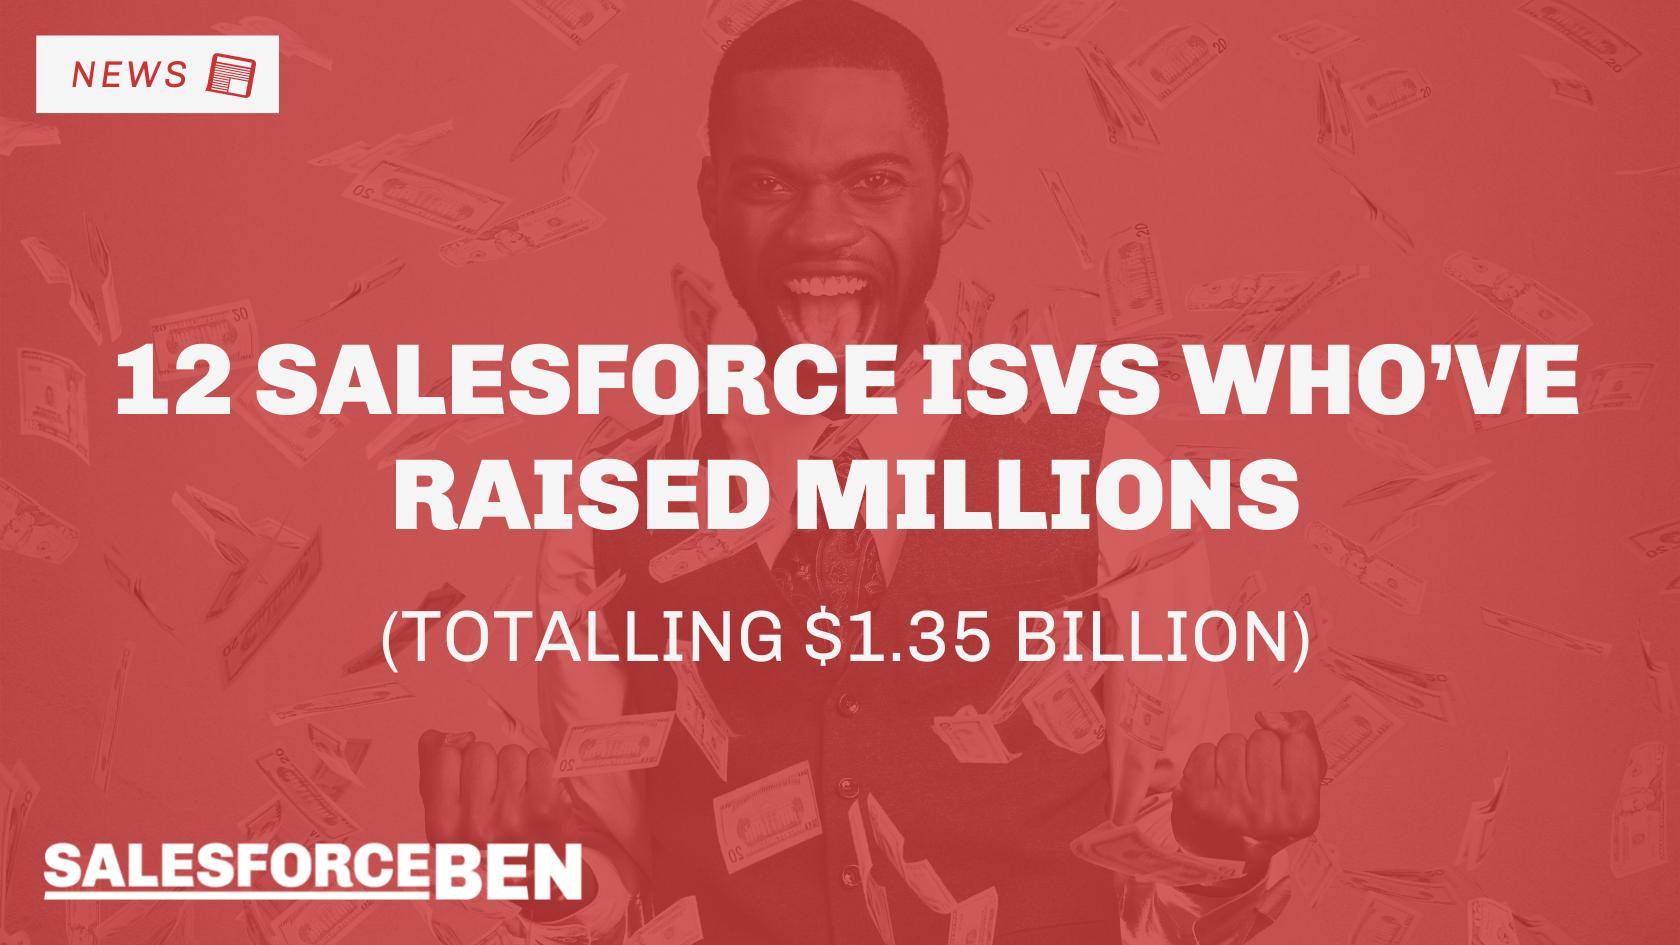 12 Salesforce ISVs Who've Raised Millions (Totalling $1.35 Billion)